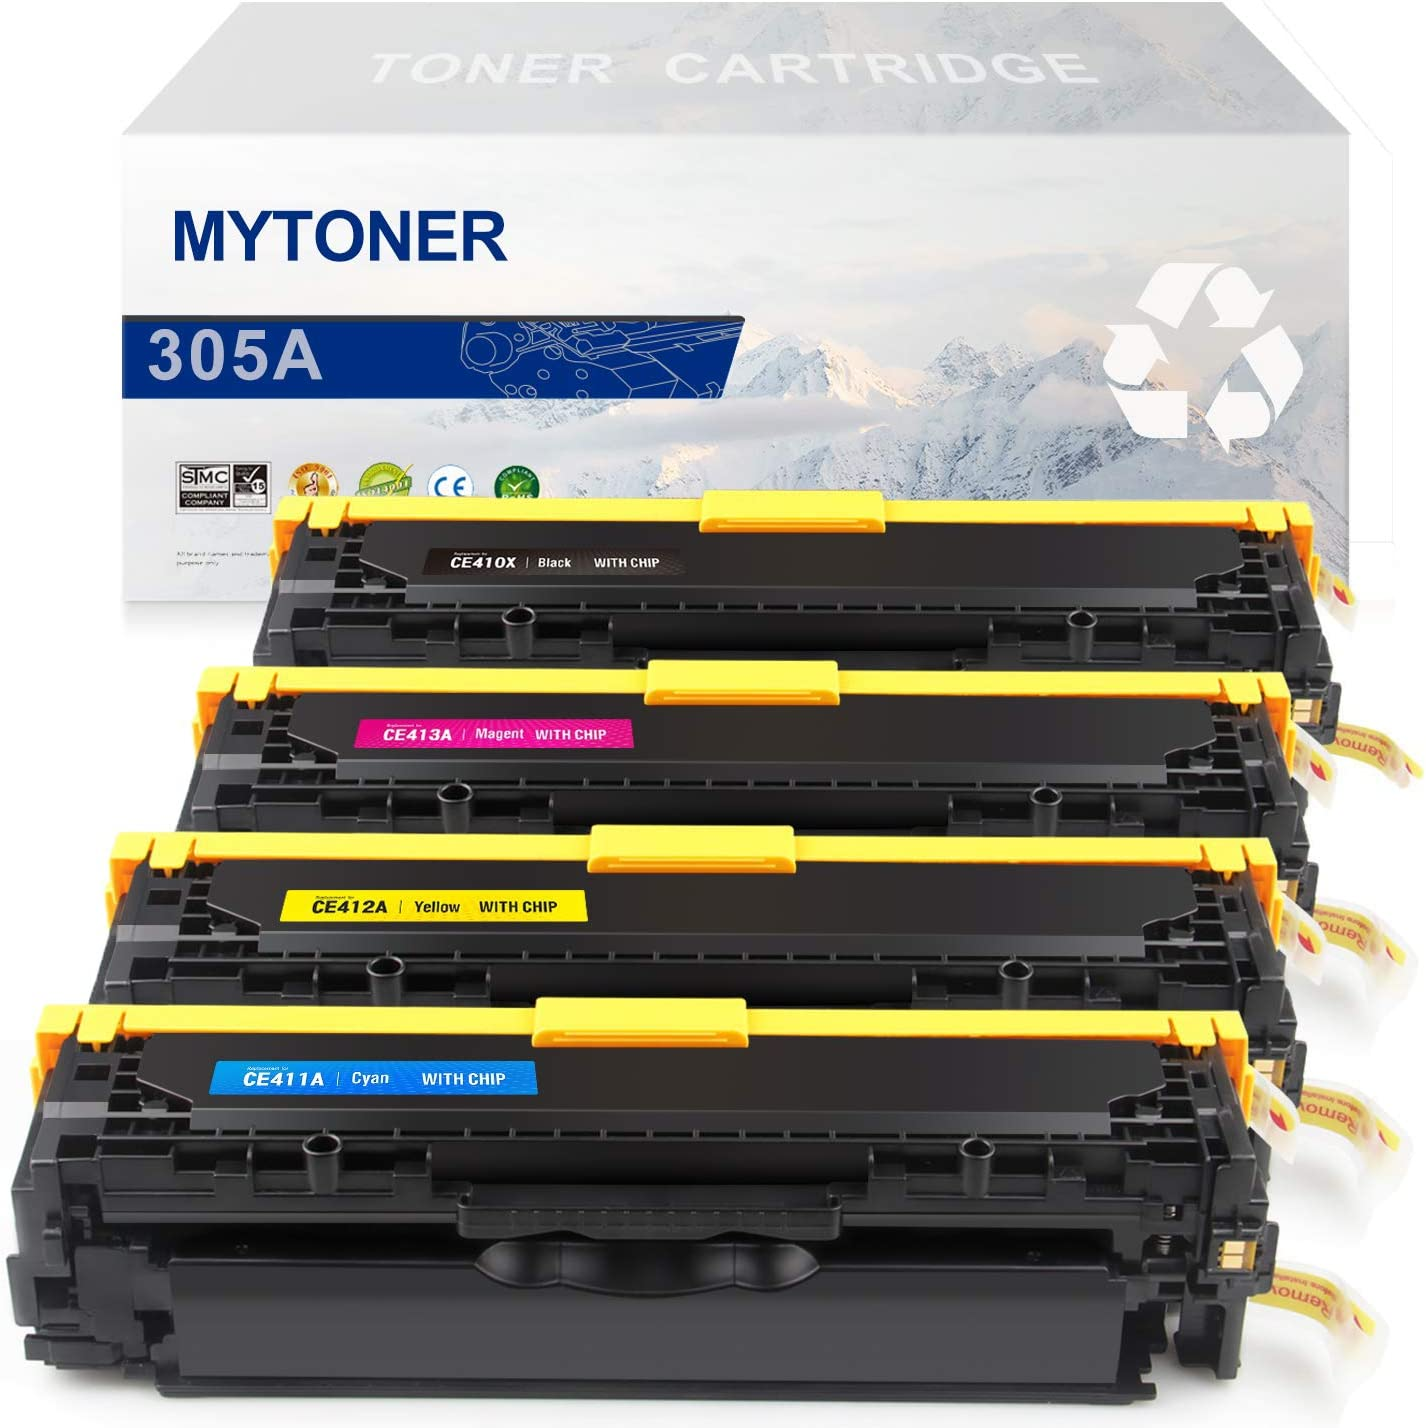 MYTONER Remanufactured Toner Cartridge Replacement for HP 305A 305X CE410X CE410A CE411A CE412A CE413A (Black Cyan Magenta Yellow, 4-Pack)